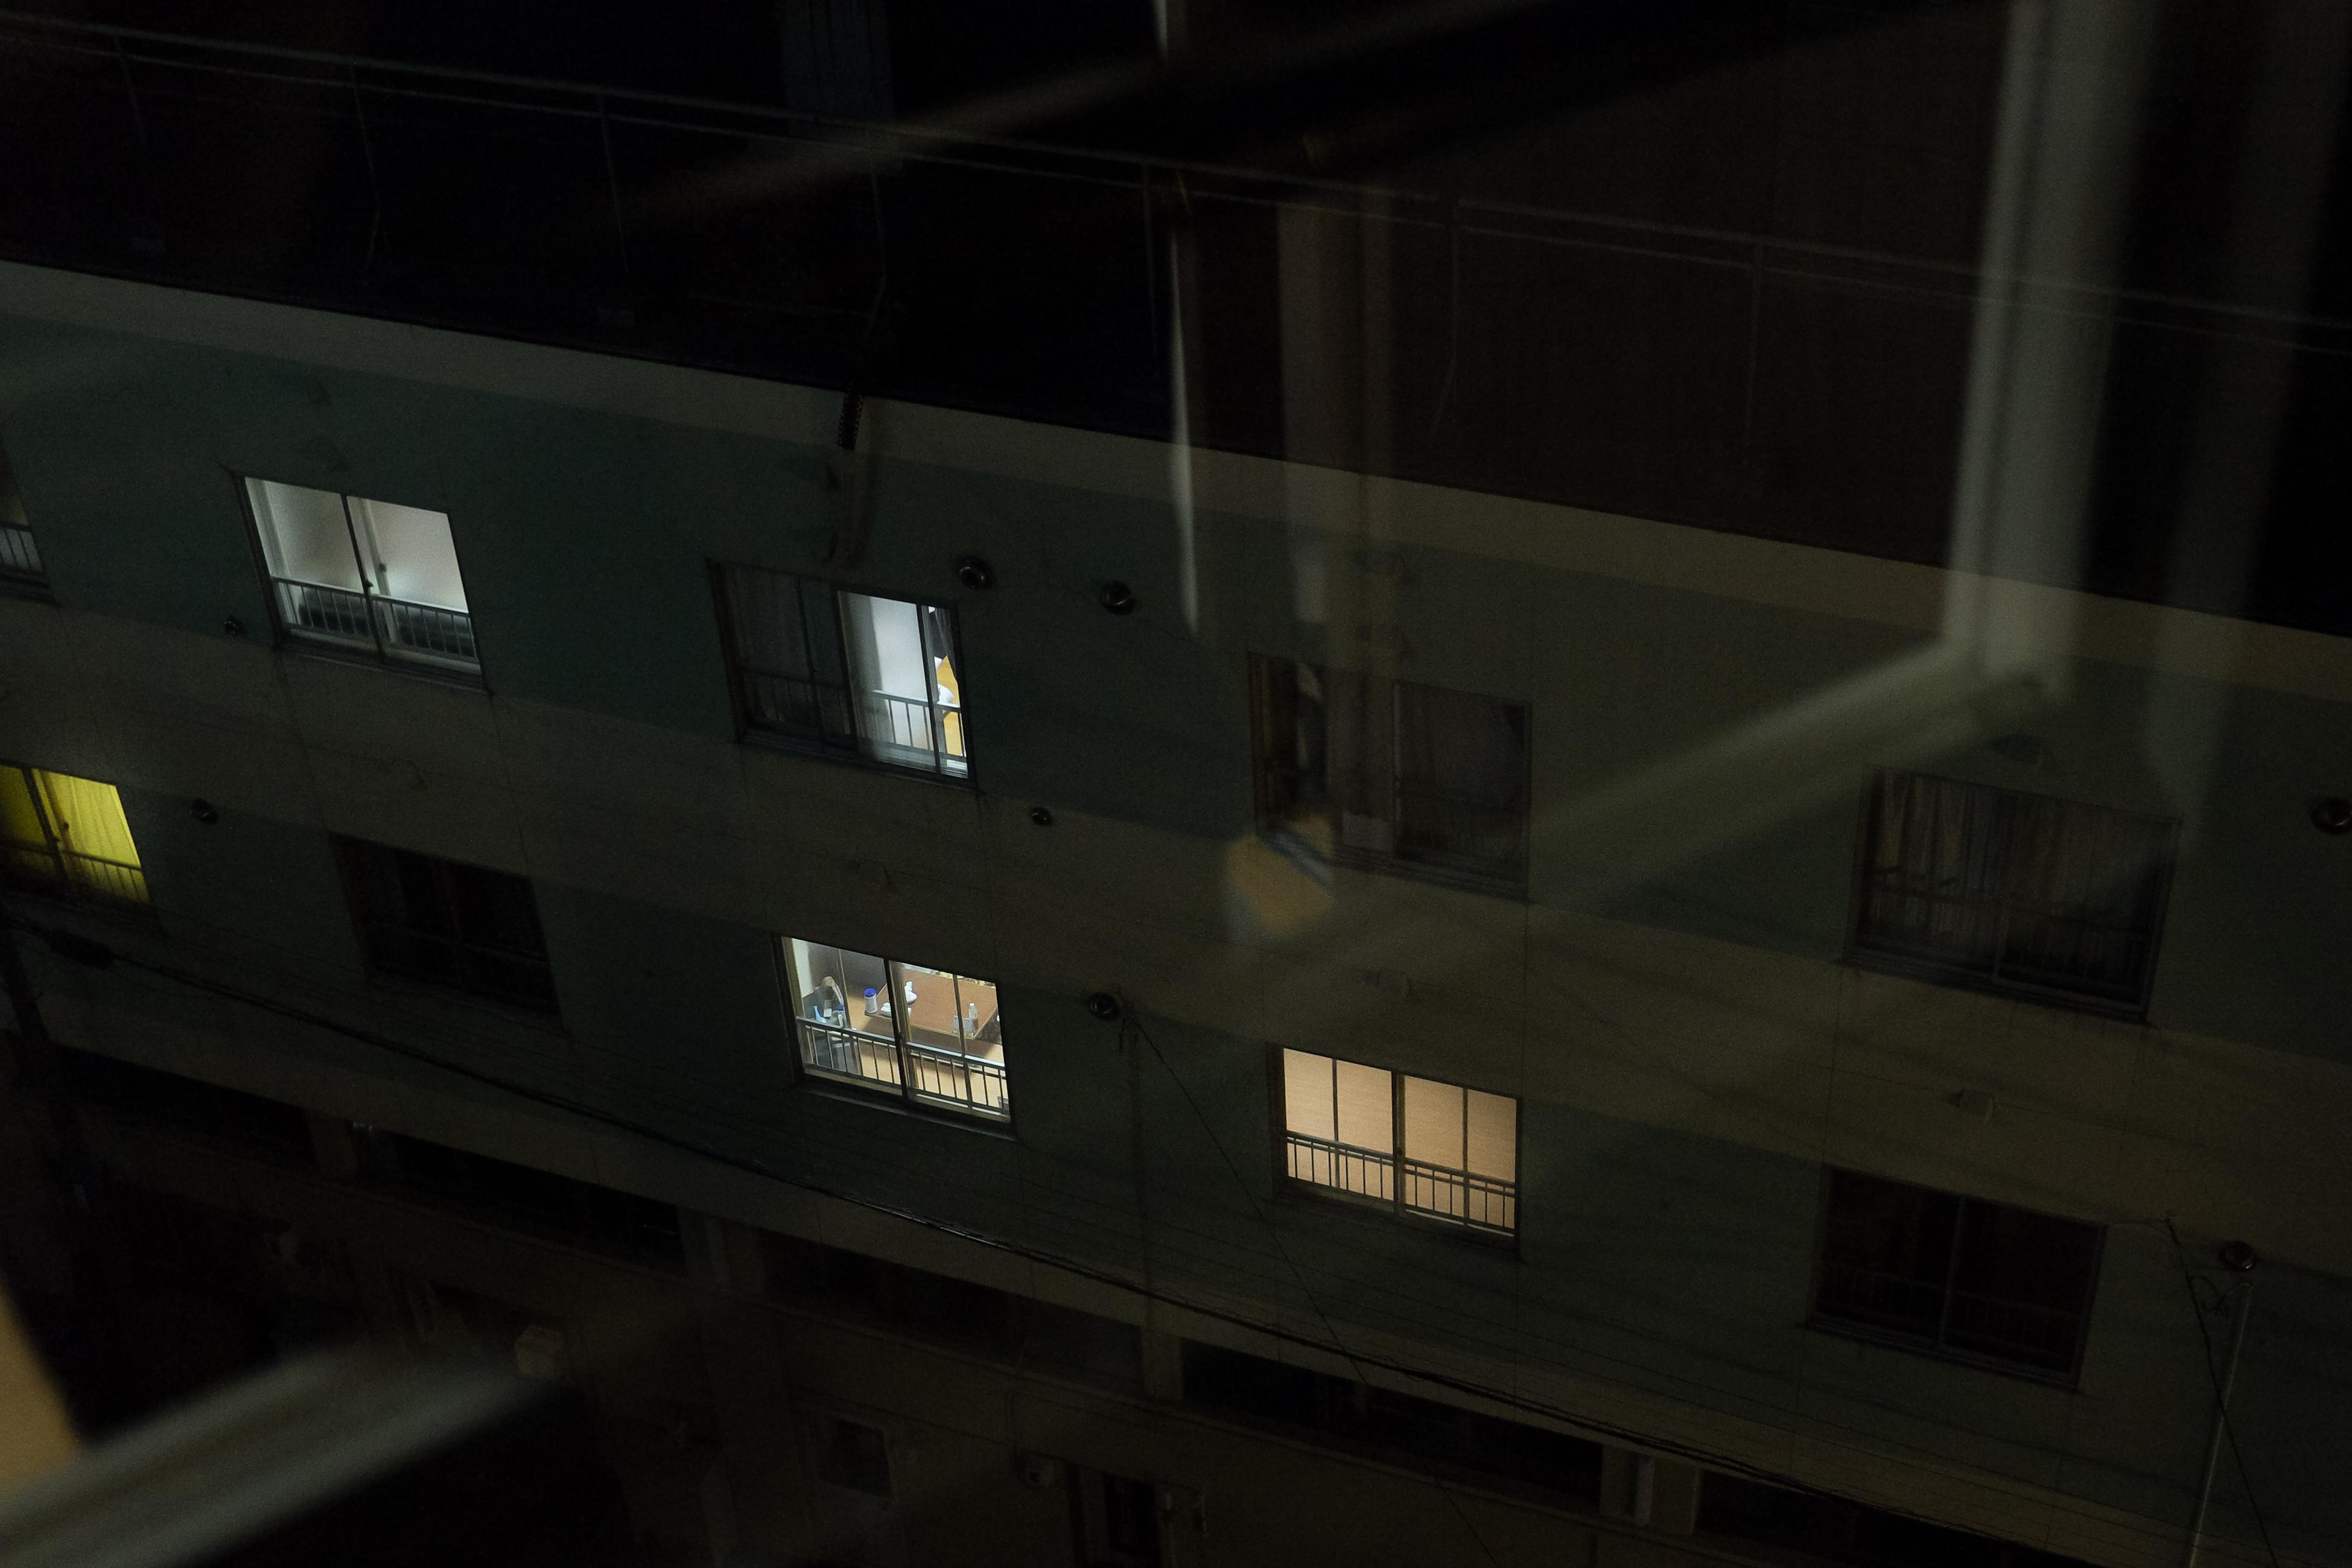 MoonlessMoonlitNight-16